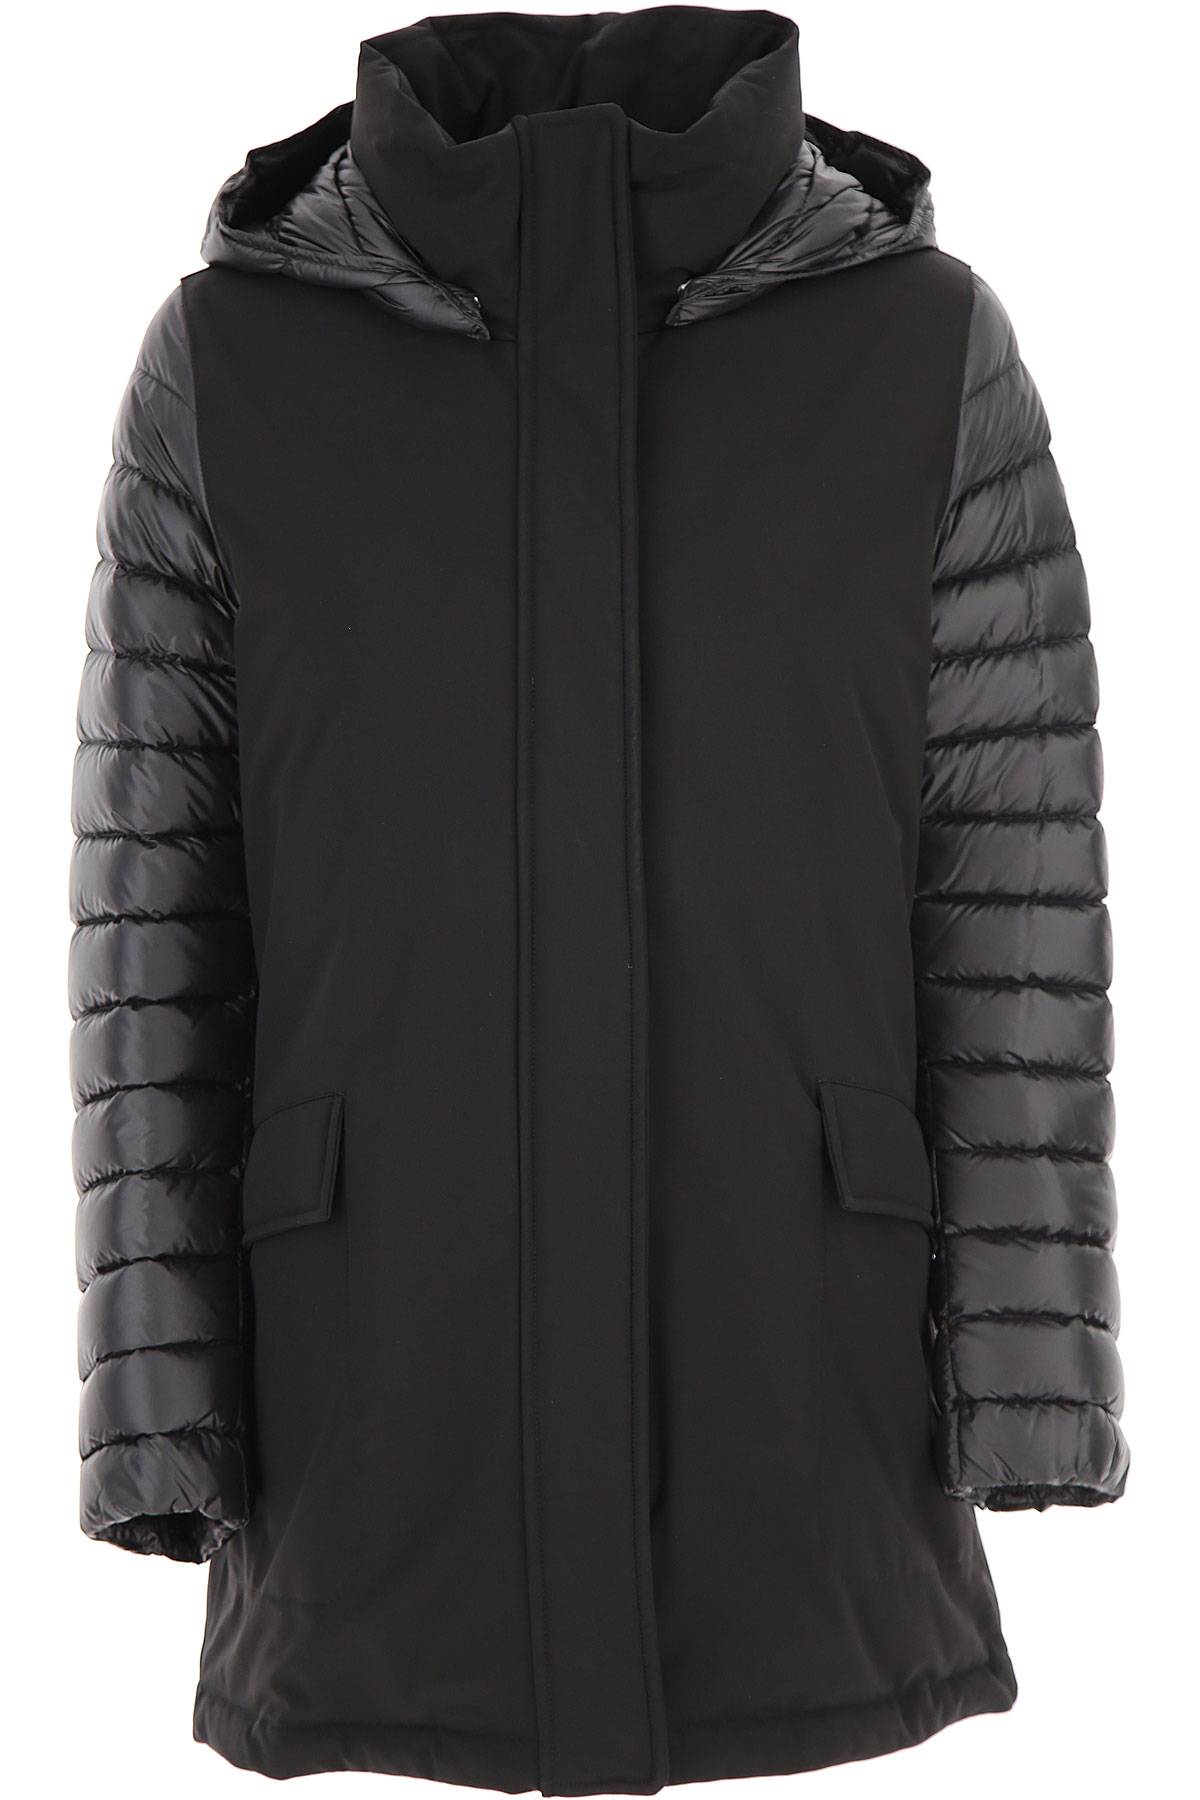 Colmar Down Jacket for Women, Puffer Ski Jacket On Sale, Black, Down, 2019, 10 12 6